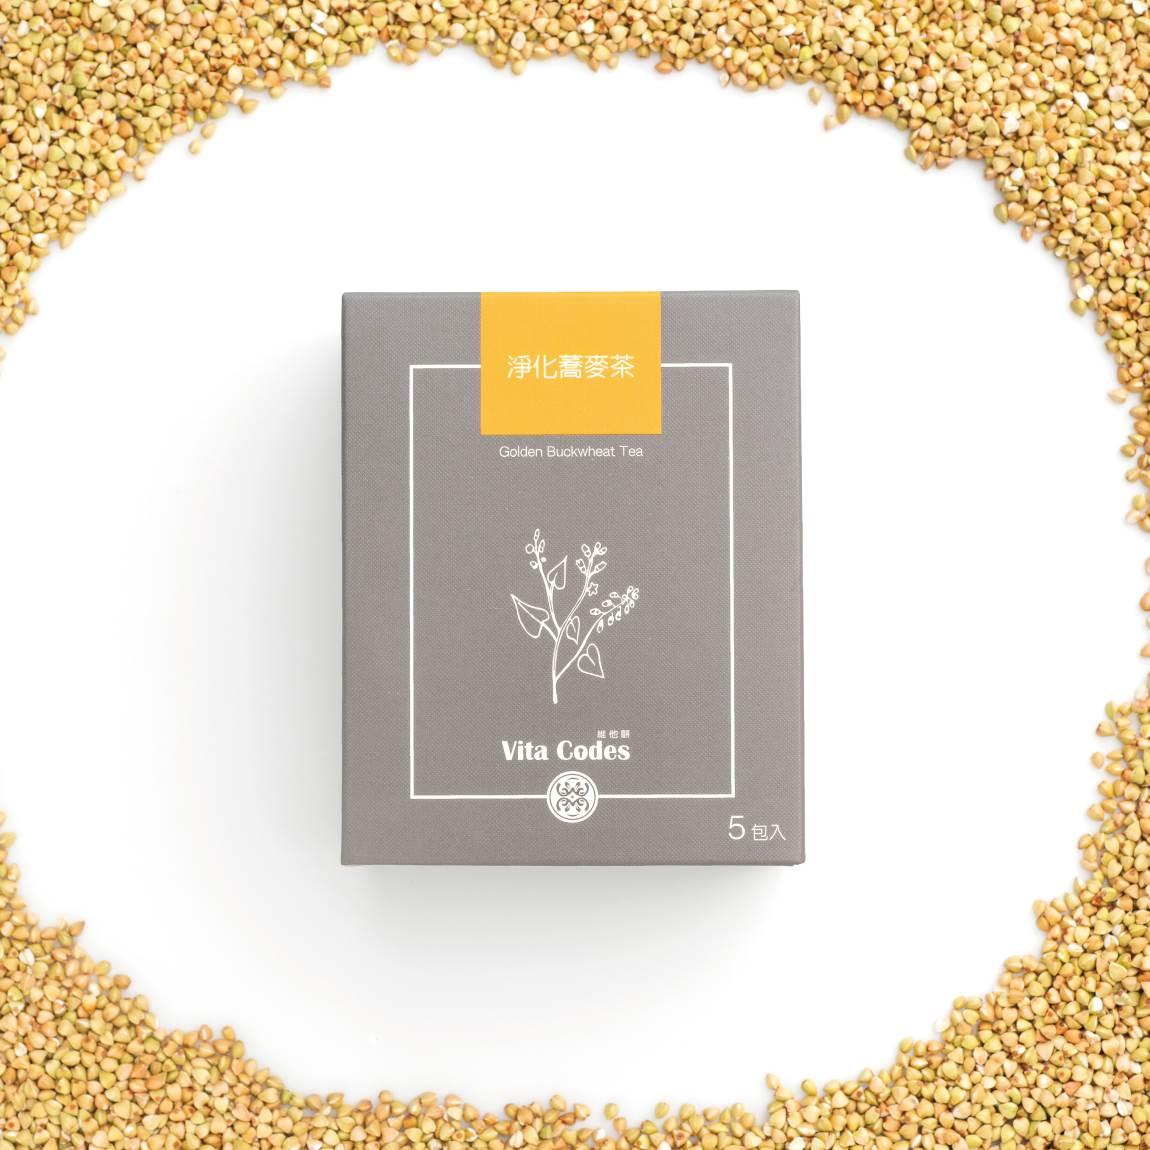 VitaCodes美顏茶-產品介紹04-3-淨化蕎麥茶